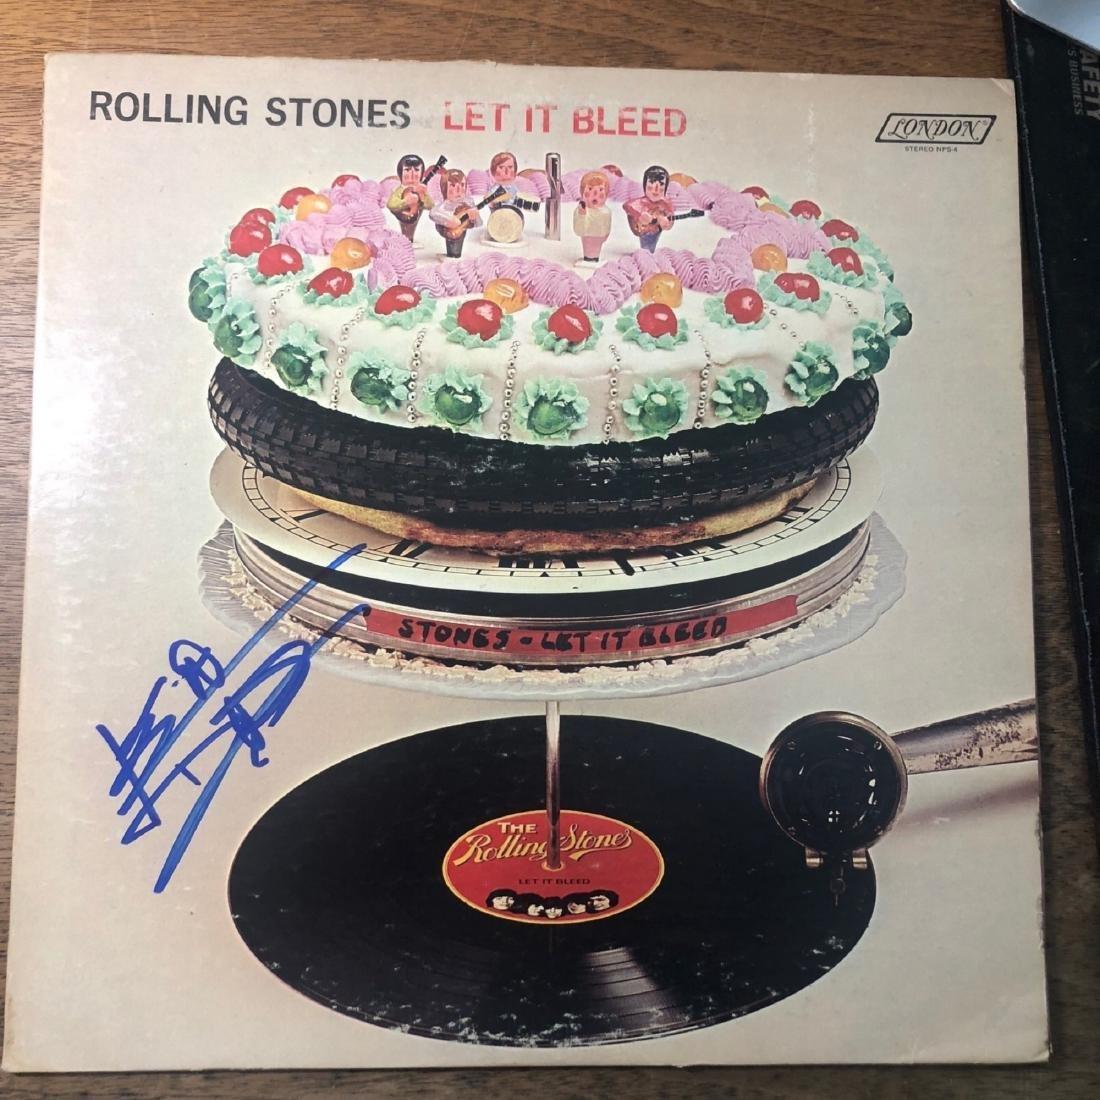 Signed Rolling Stones Let It Bleed Album